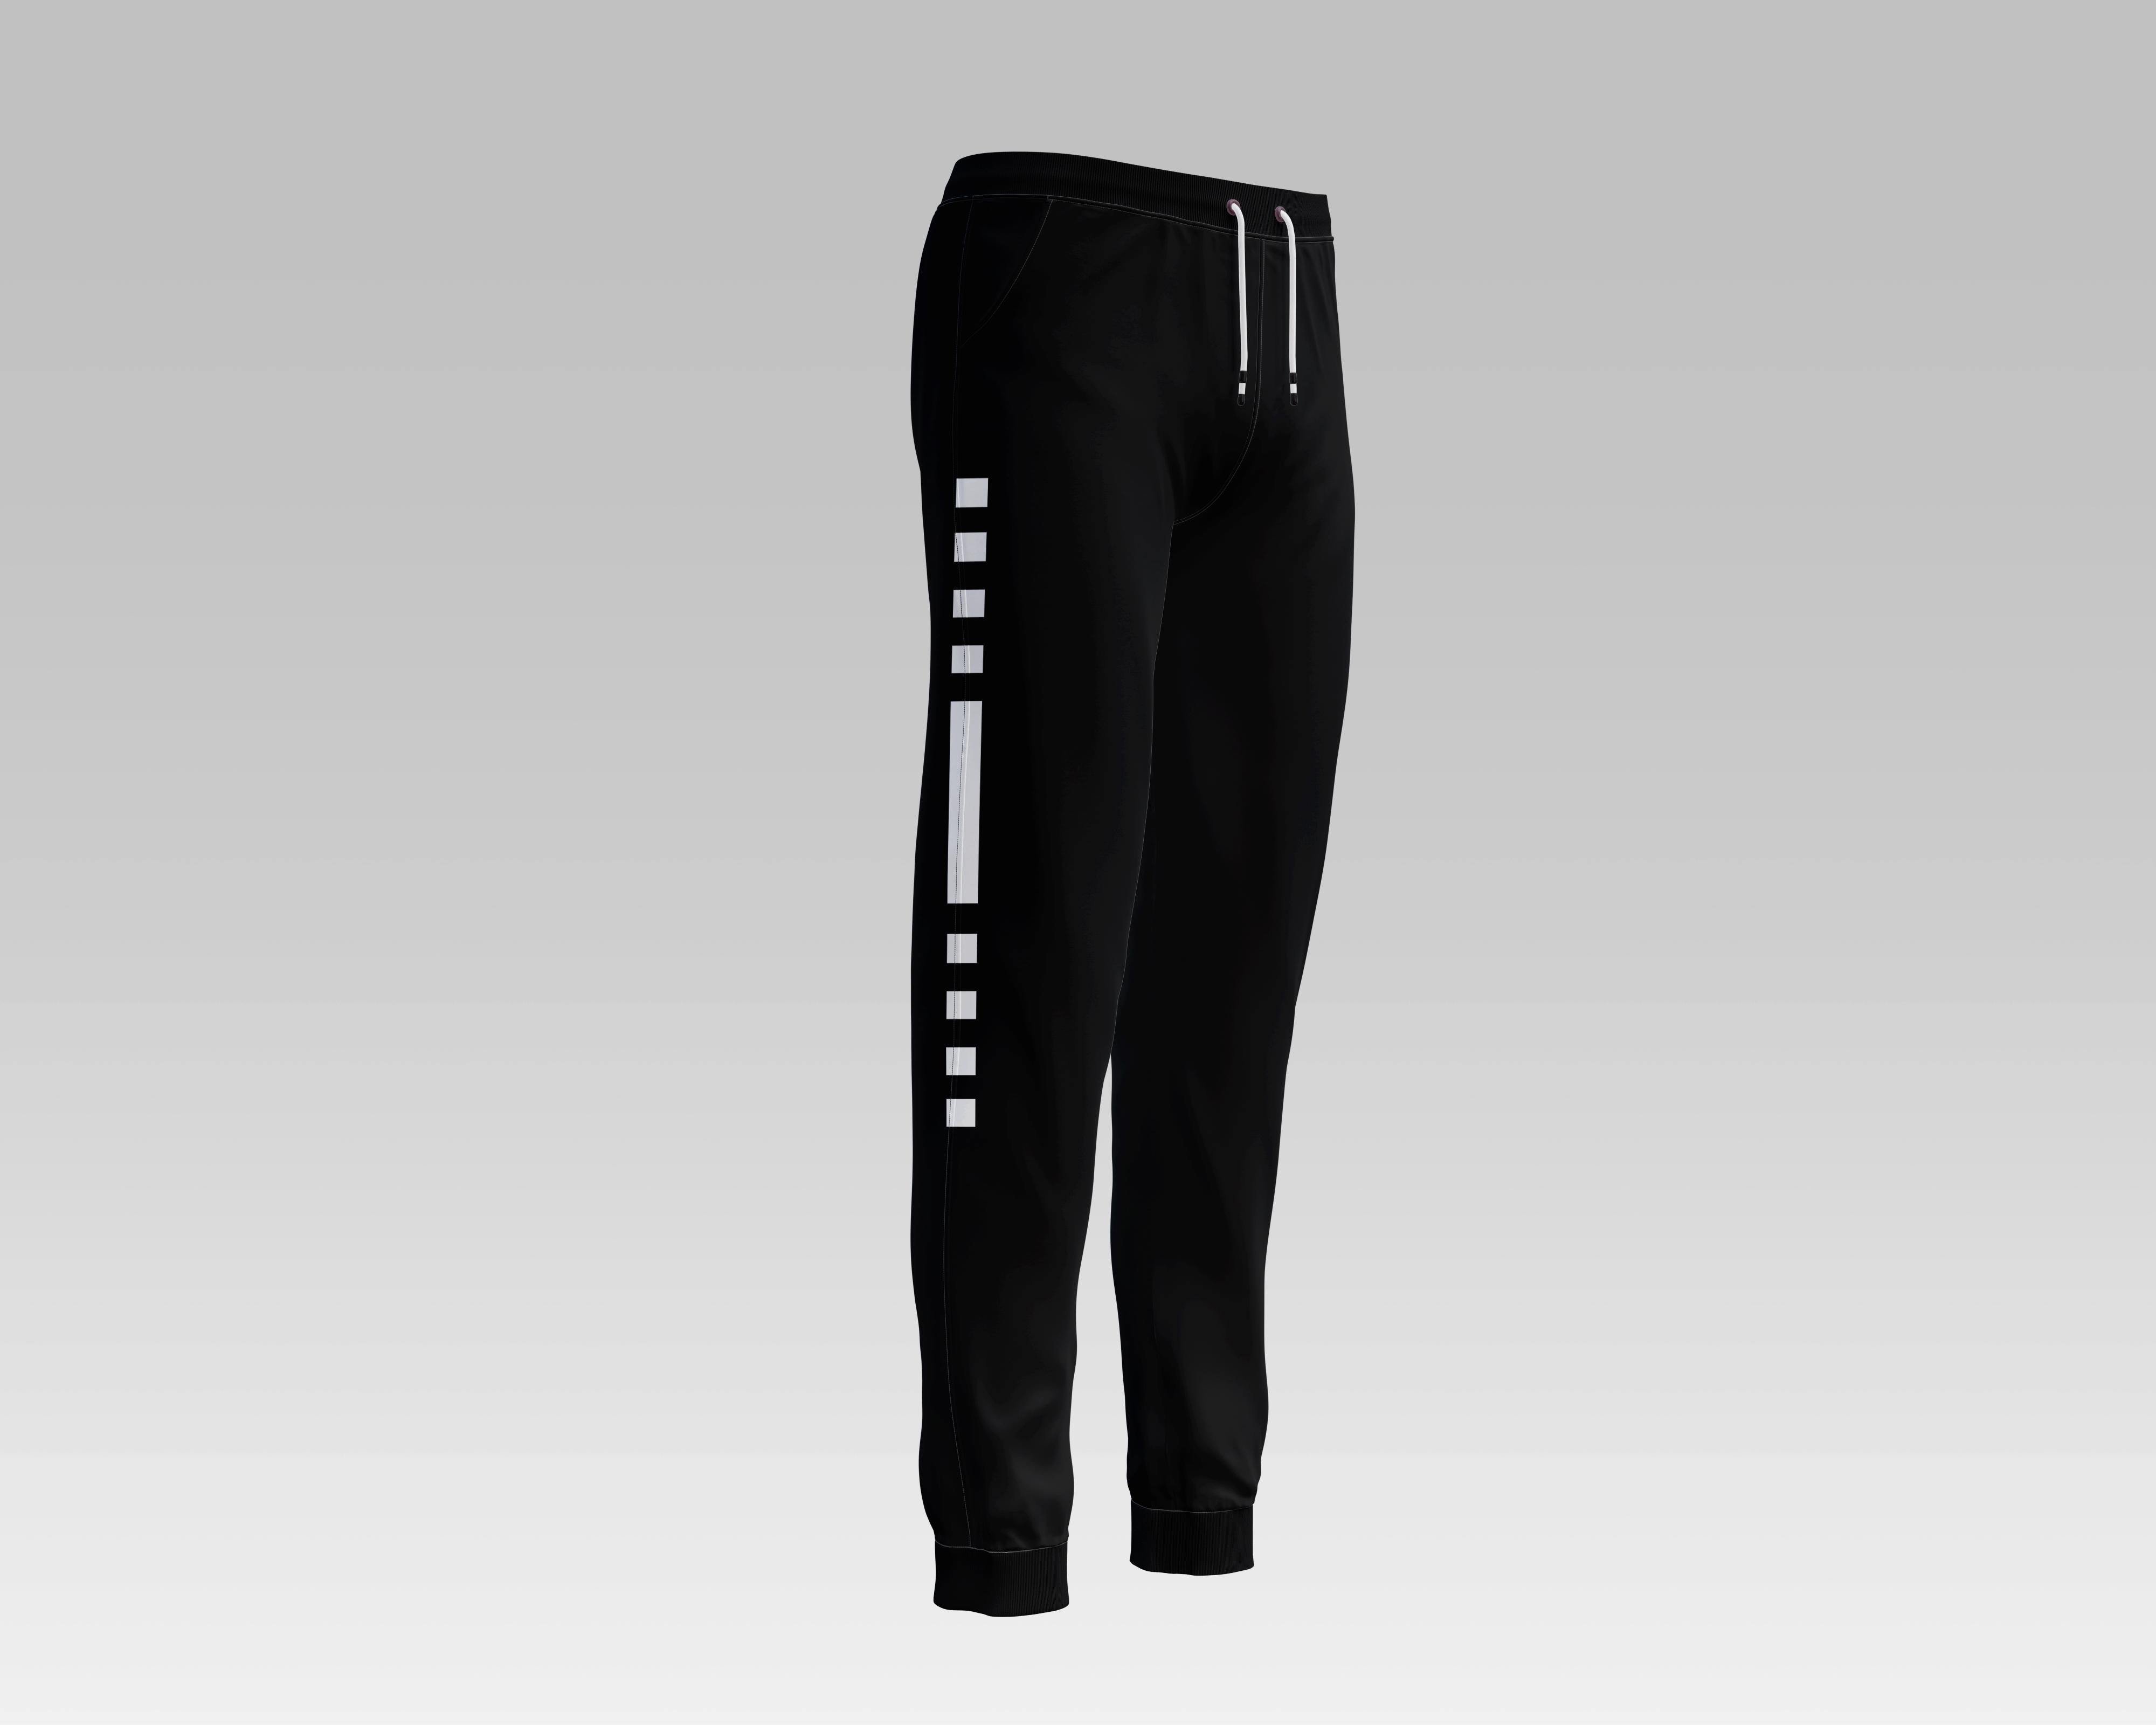 Decent Interlock Sports Trousers for men Fashion Joggers Gym Trousers Premium Quality